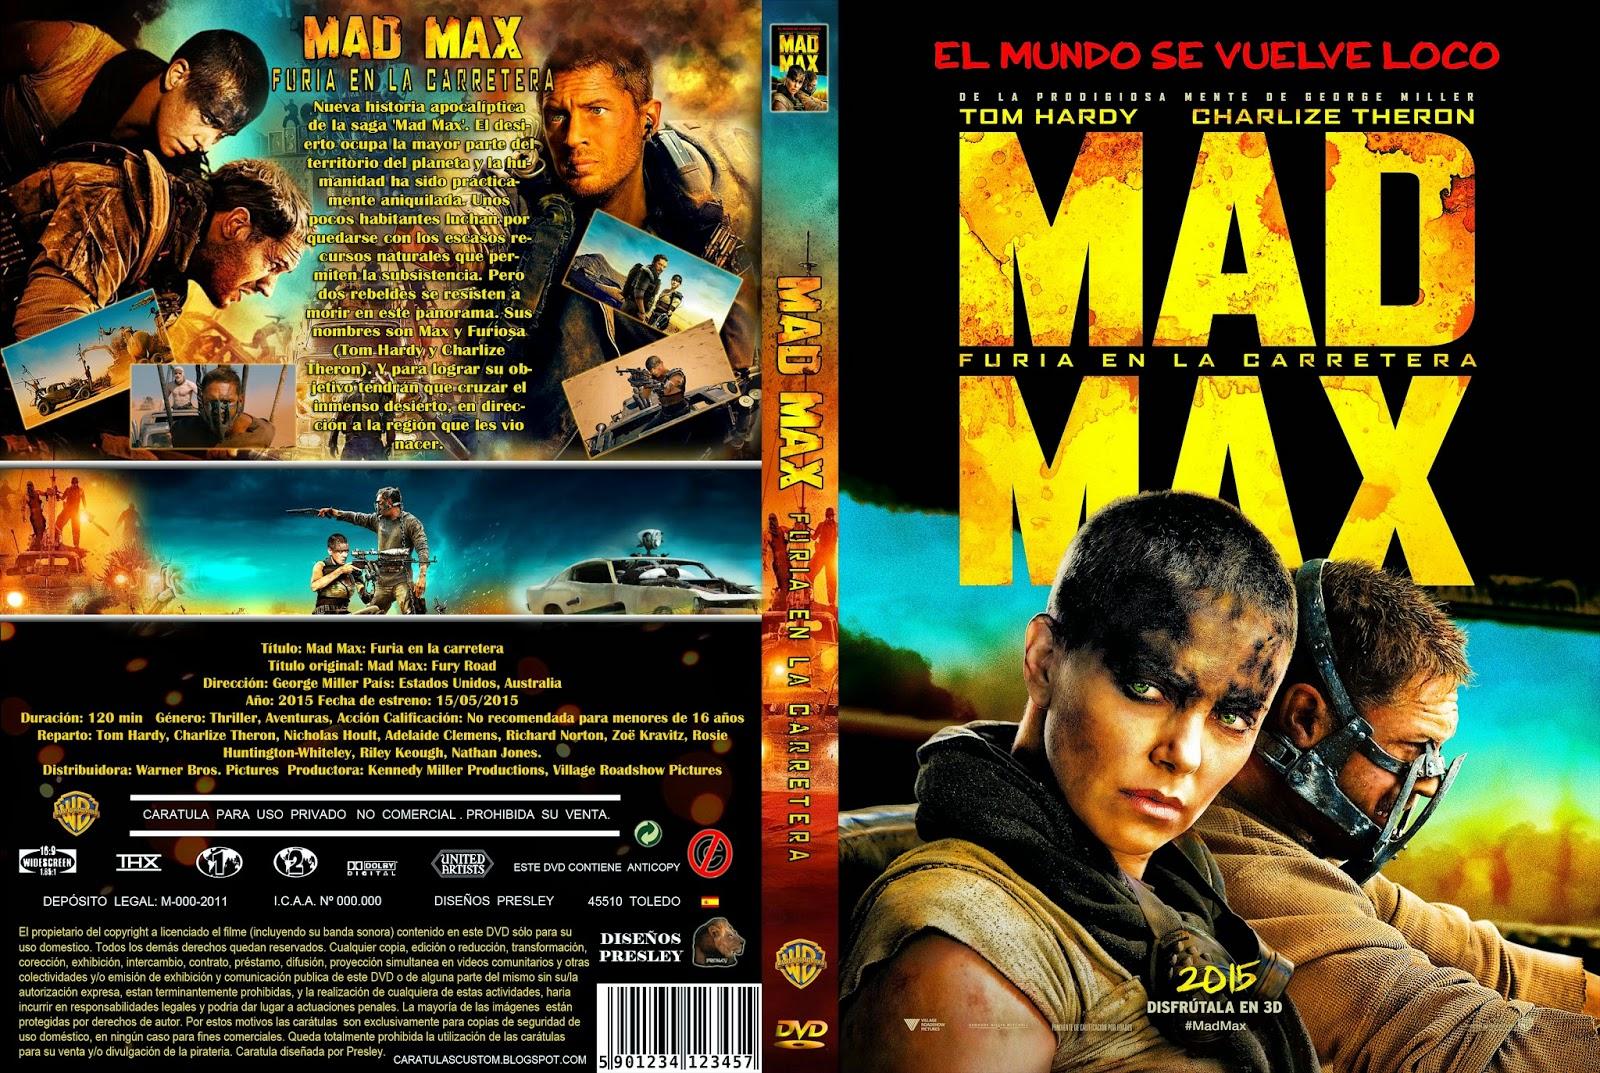 DVDMadMaxFuriaenlacarretera